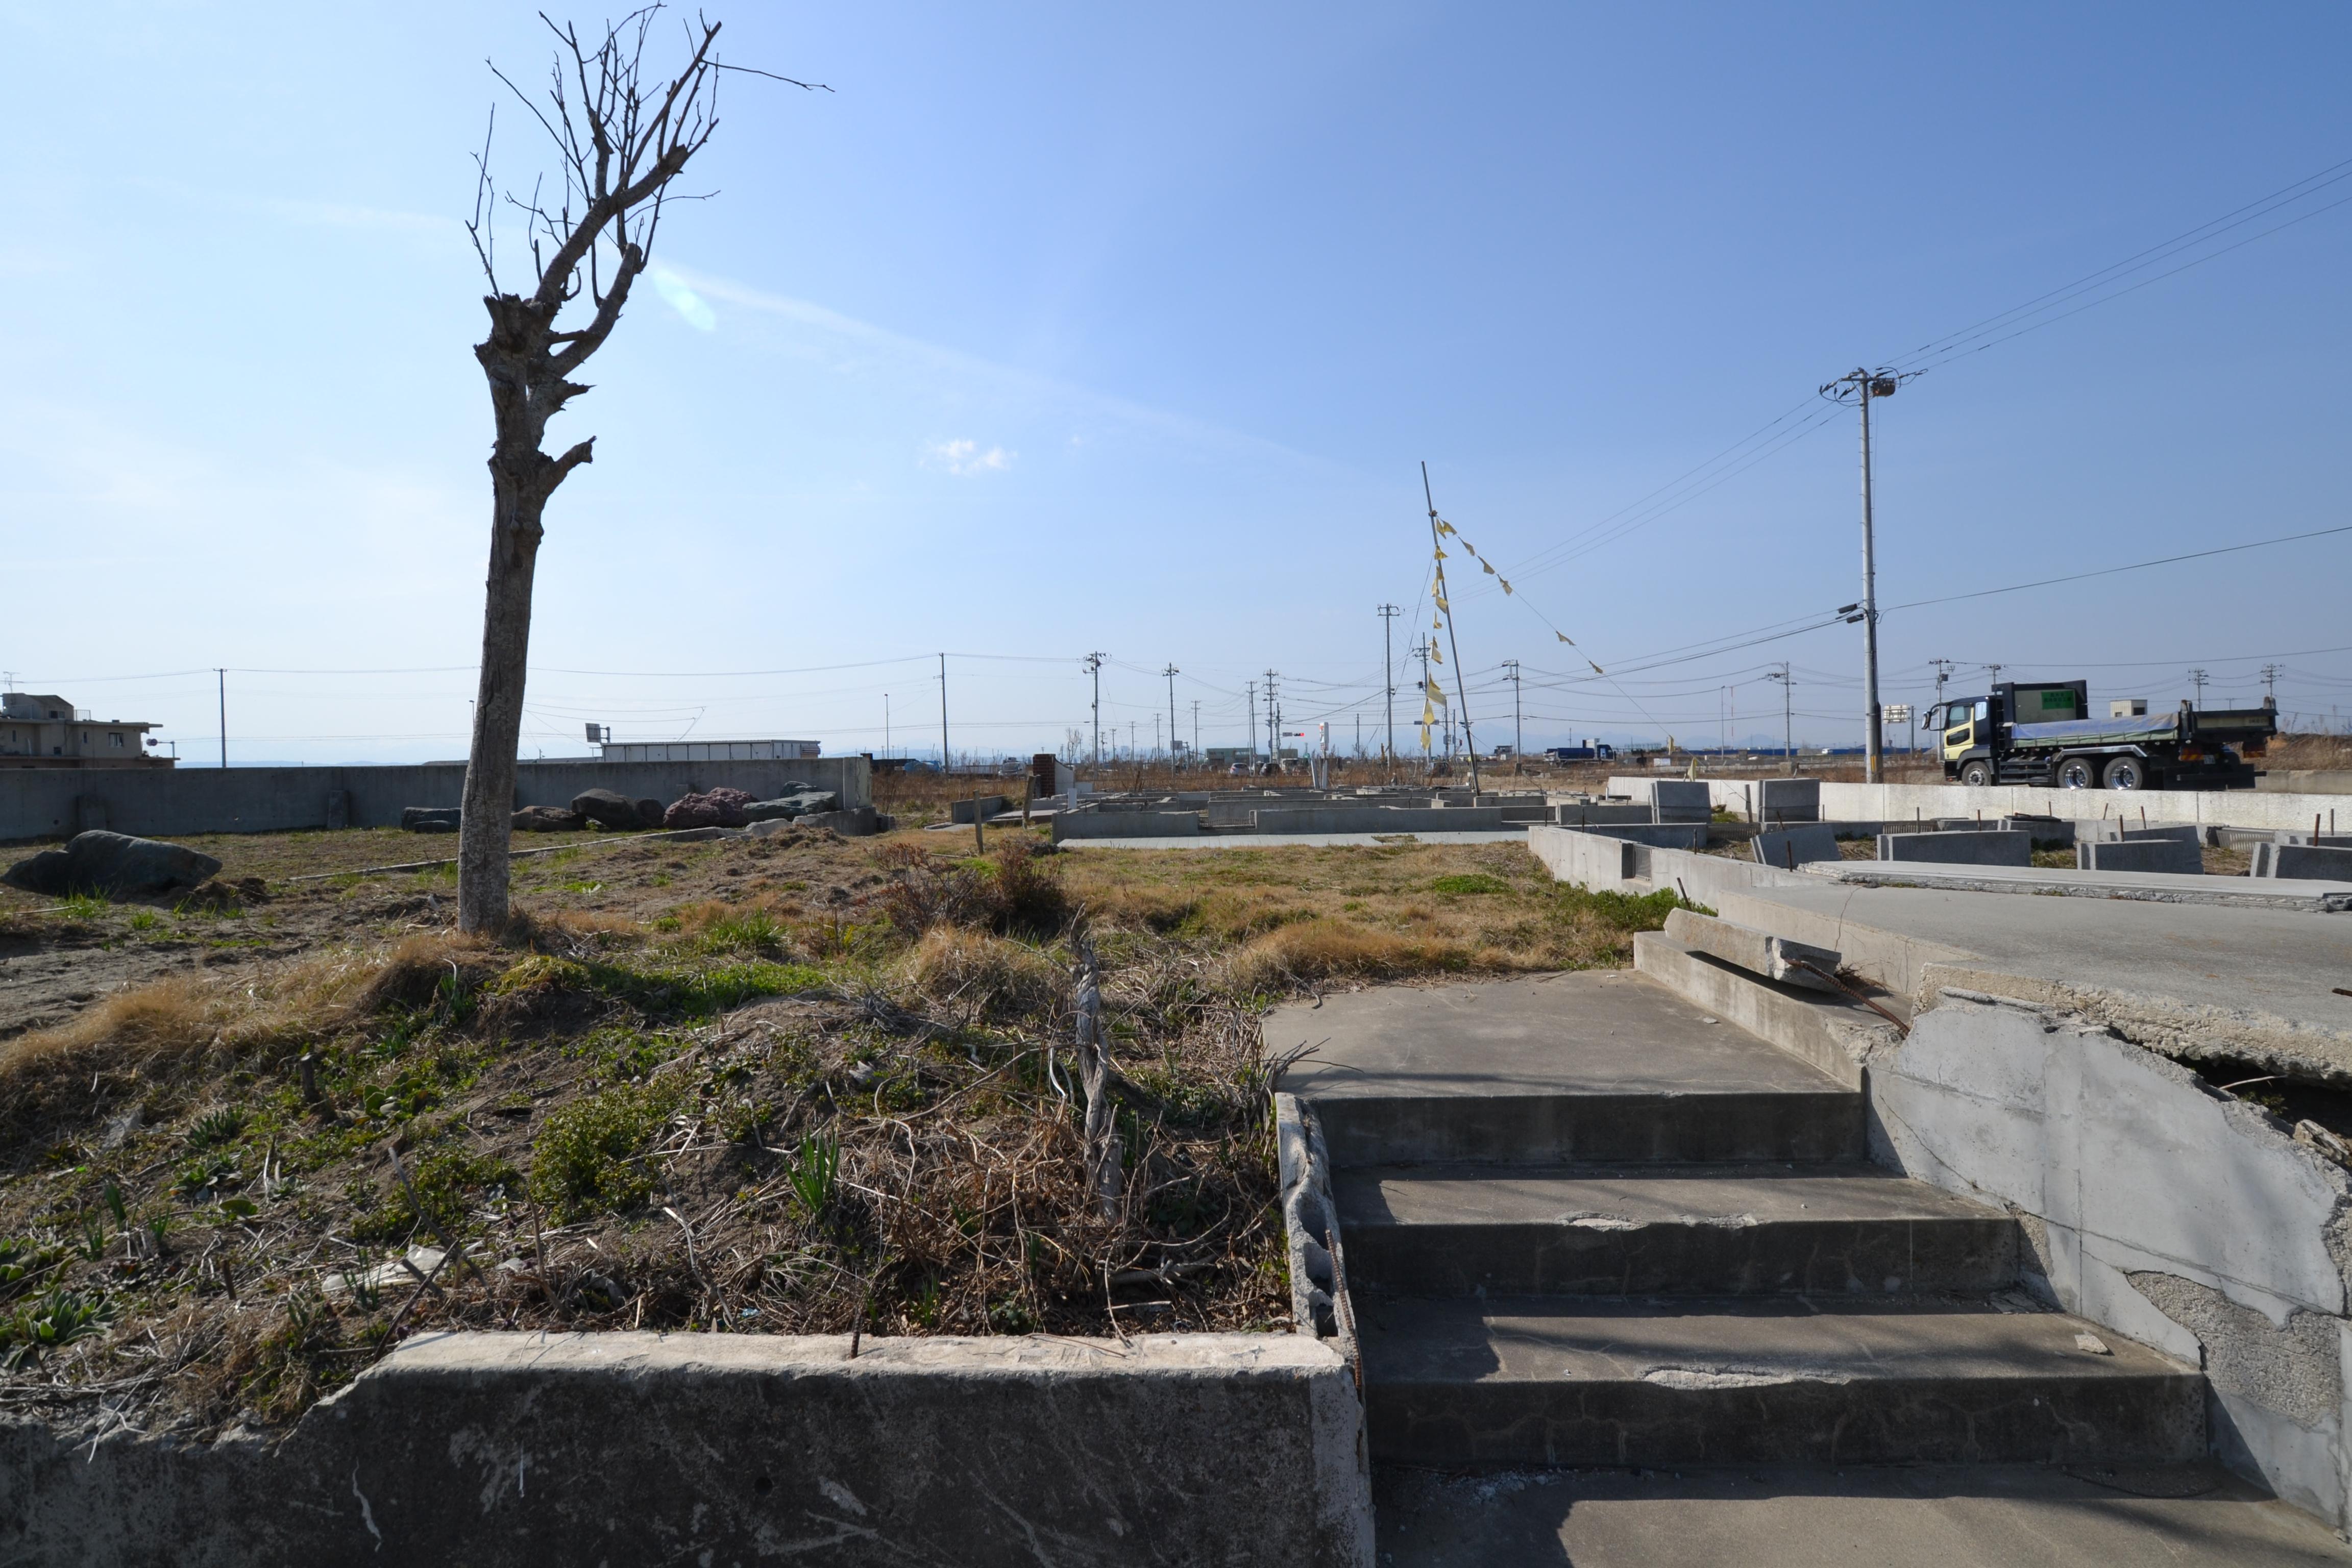 arahama tree, steps no house, dump truck.JPG